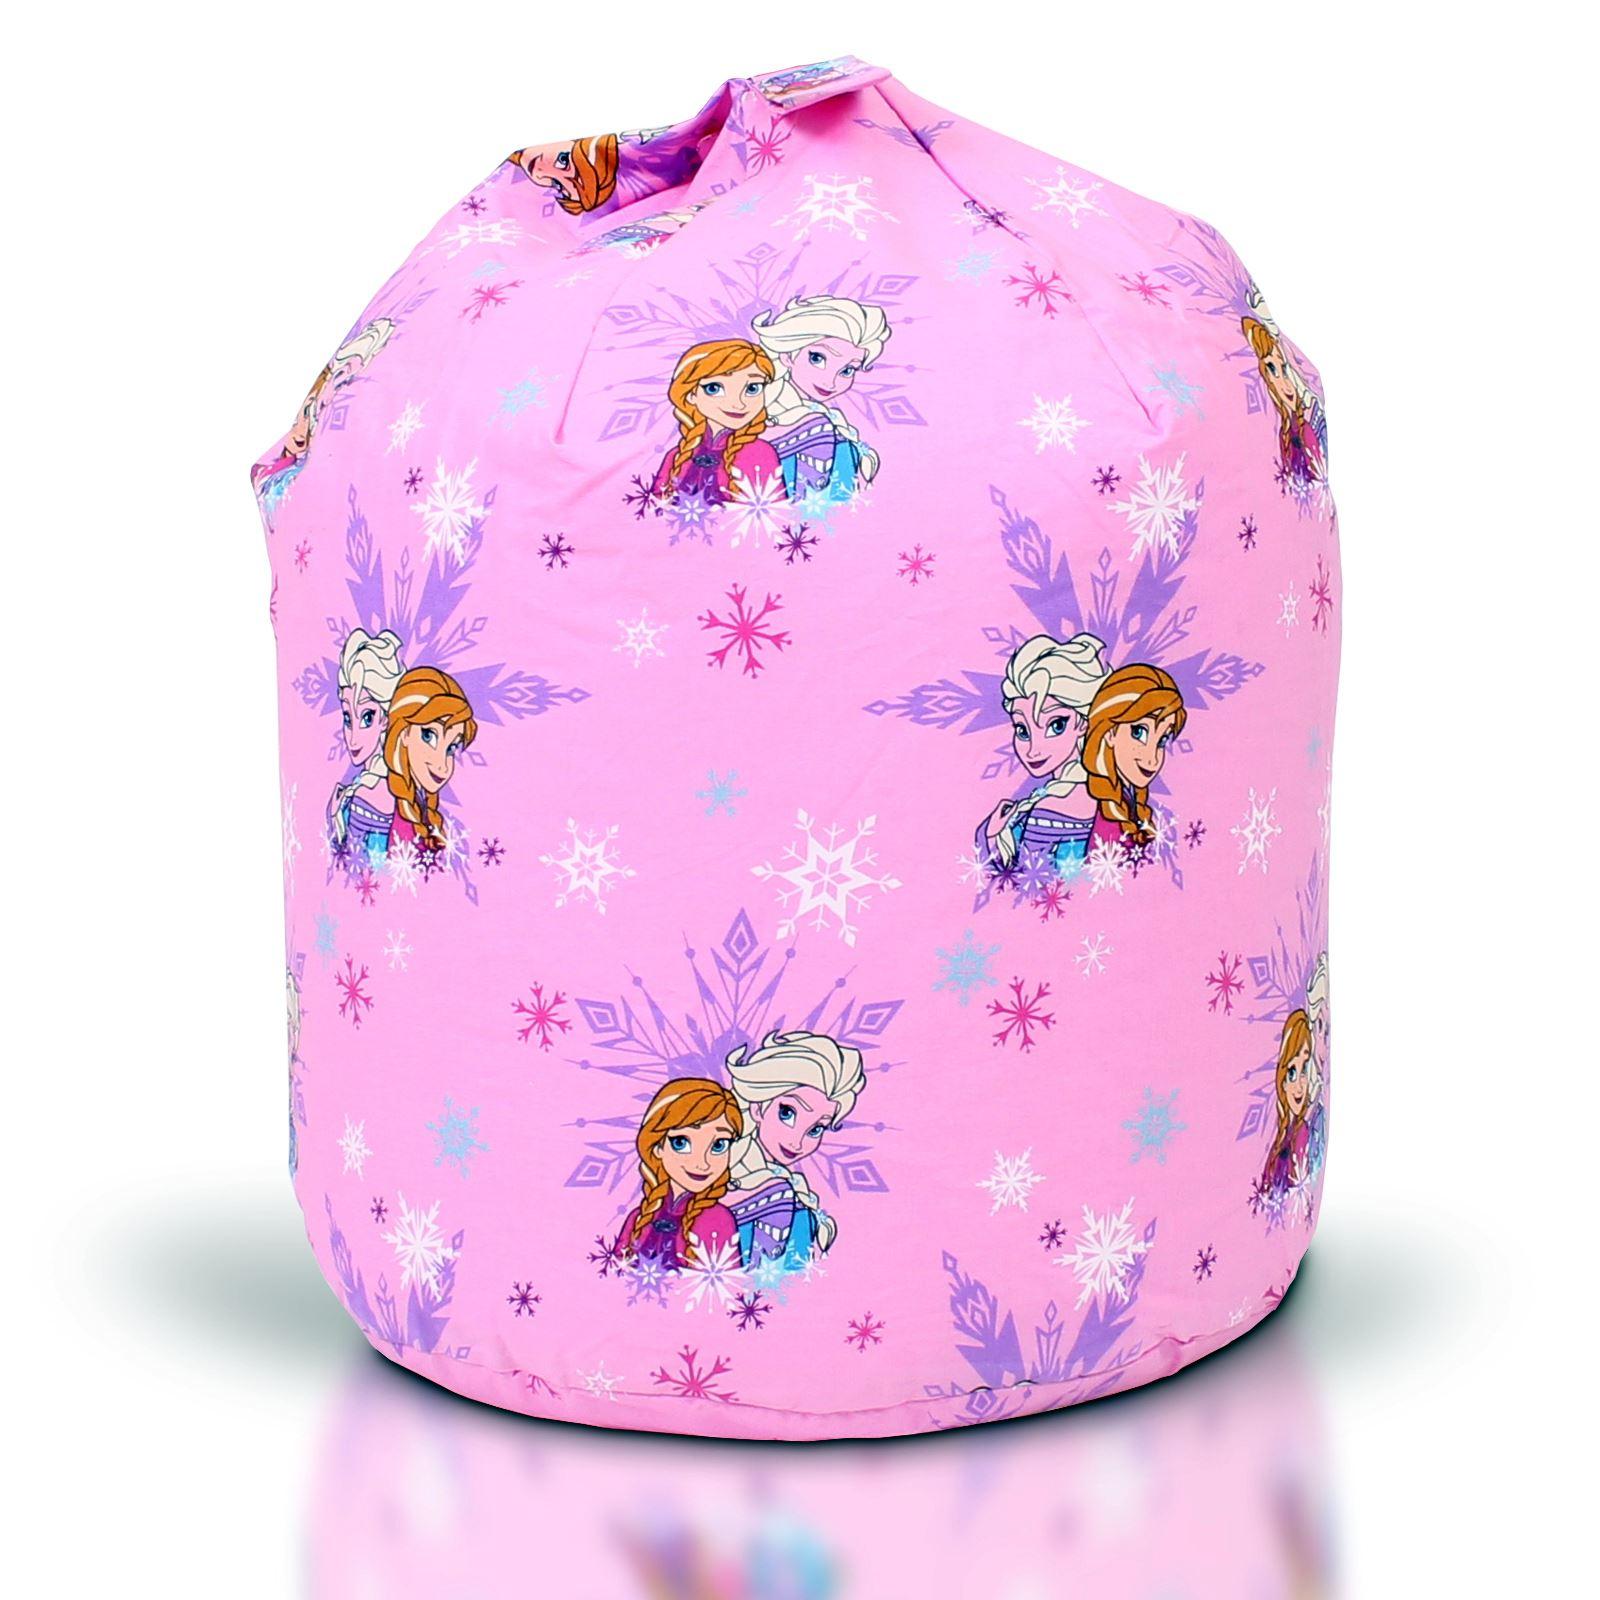 Disney-Frozen-Elsa-Anna-Olaf-Kids-Childrens-Girls-Pink-Bean-Bag-Refill-Cover